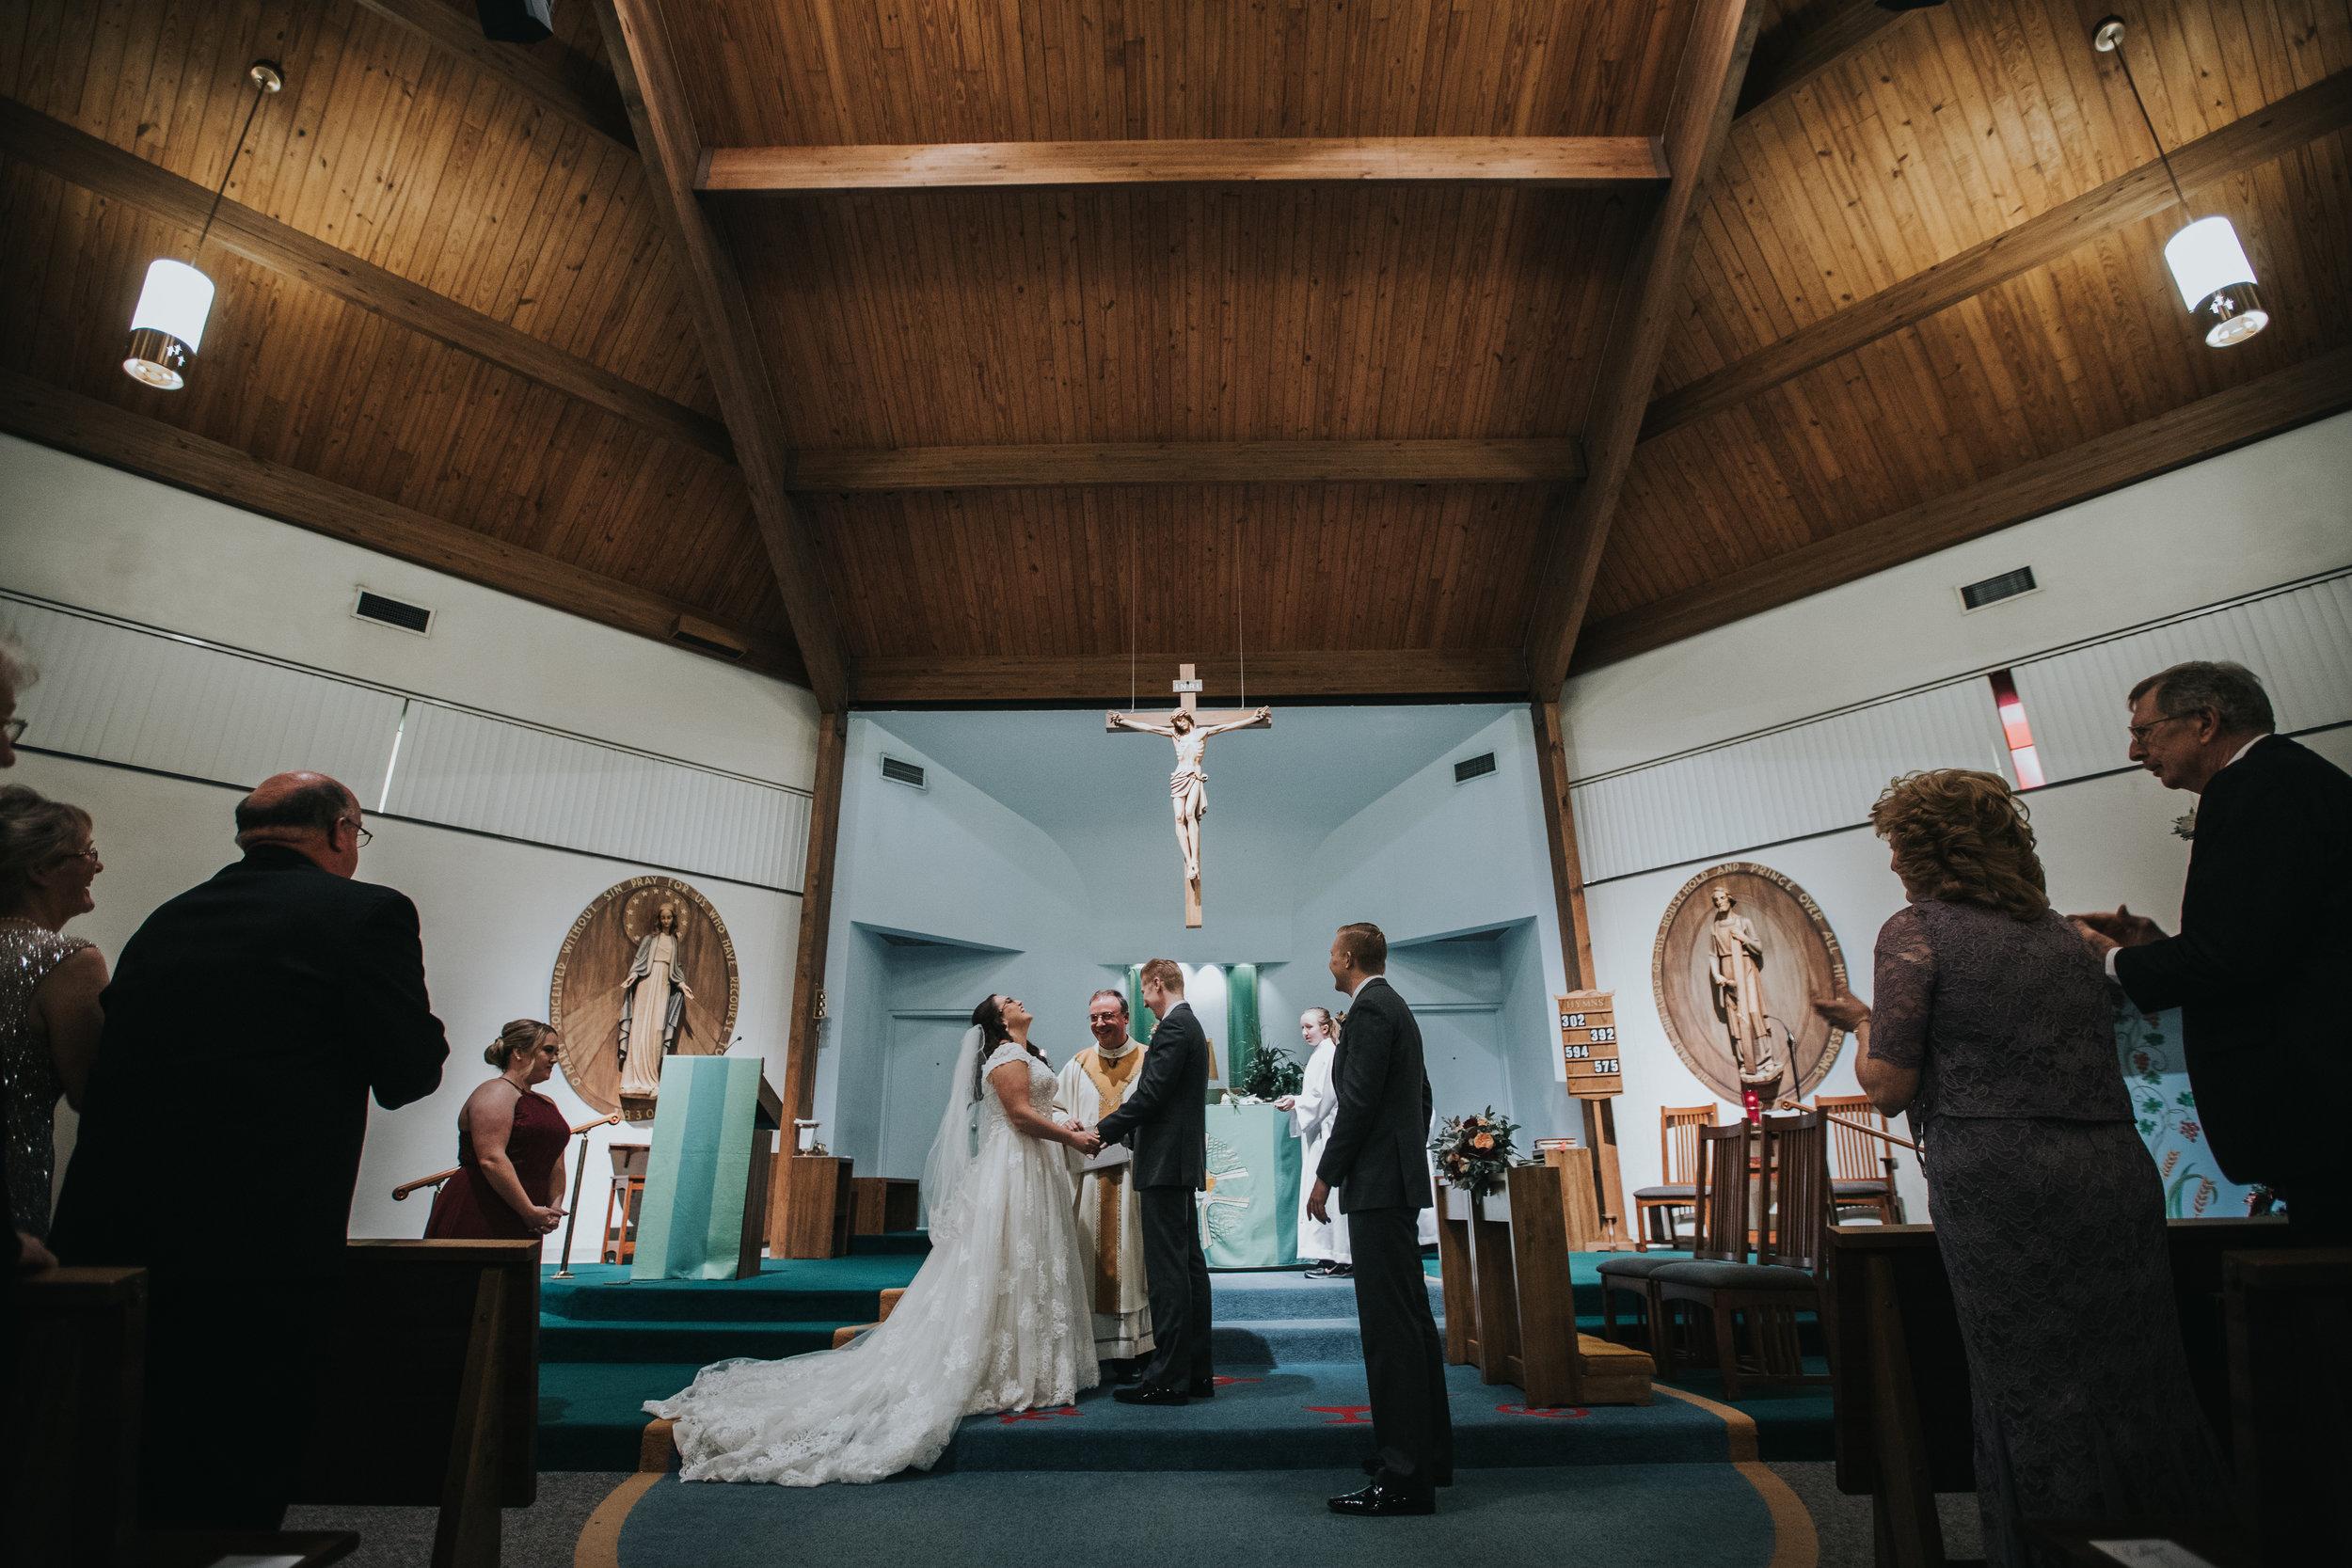 New-Jersey-Wedding-Photography-Fishers-Tudor-House-JennaLynnPhotography-Ceremony-Kathleen&Eddie-97.jpg